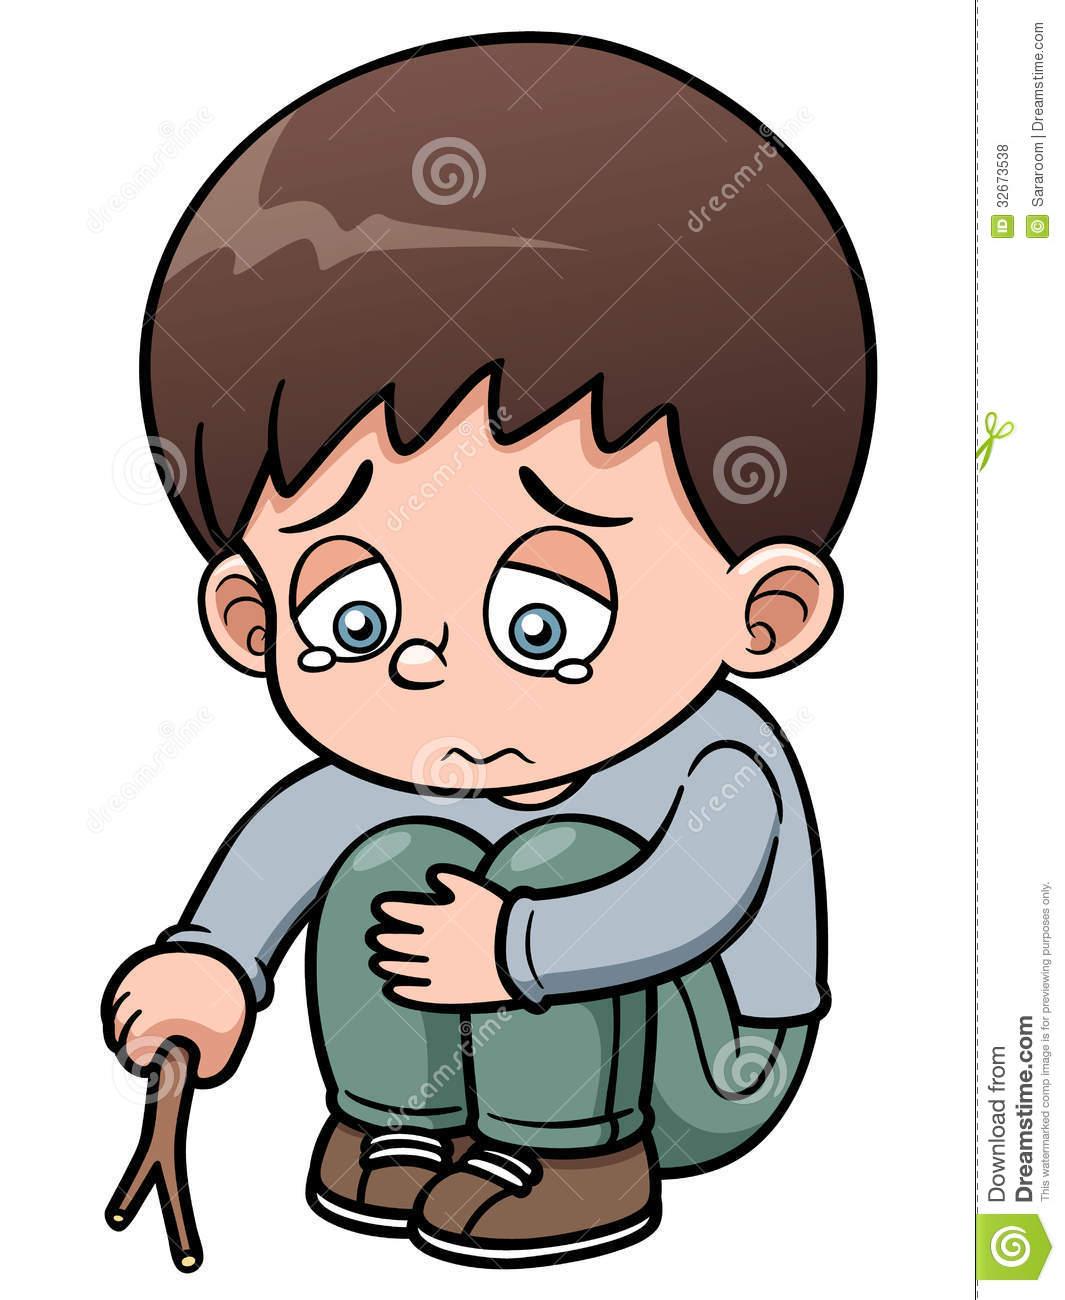 Sad Boy Royalty Free Stock Photos Image 32673538